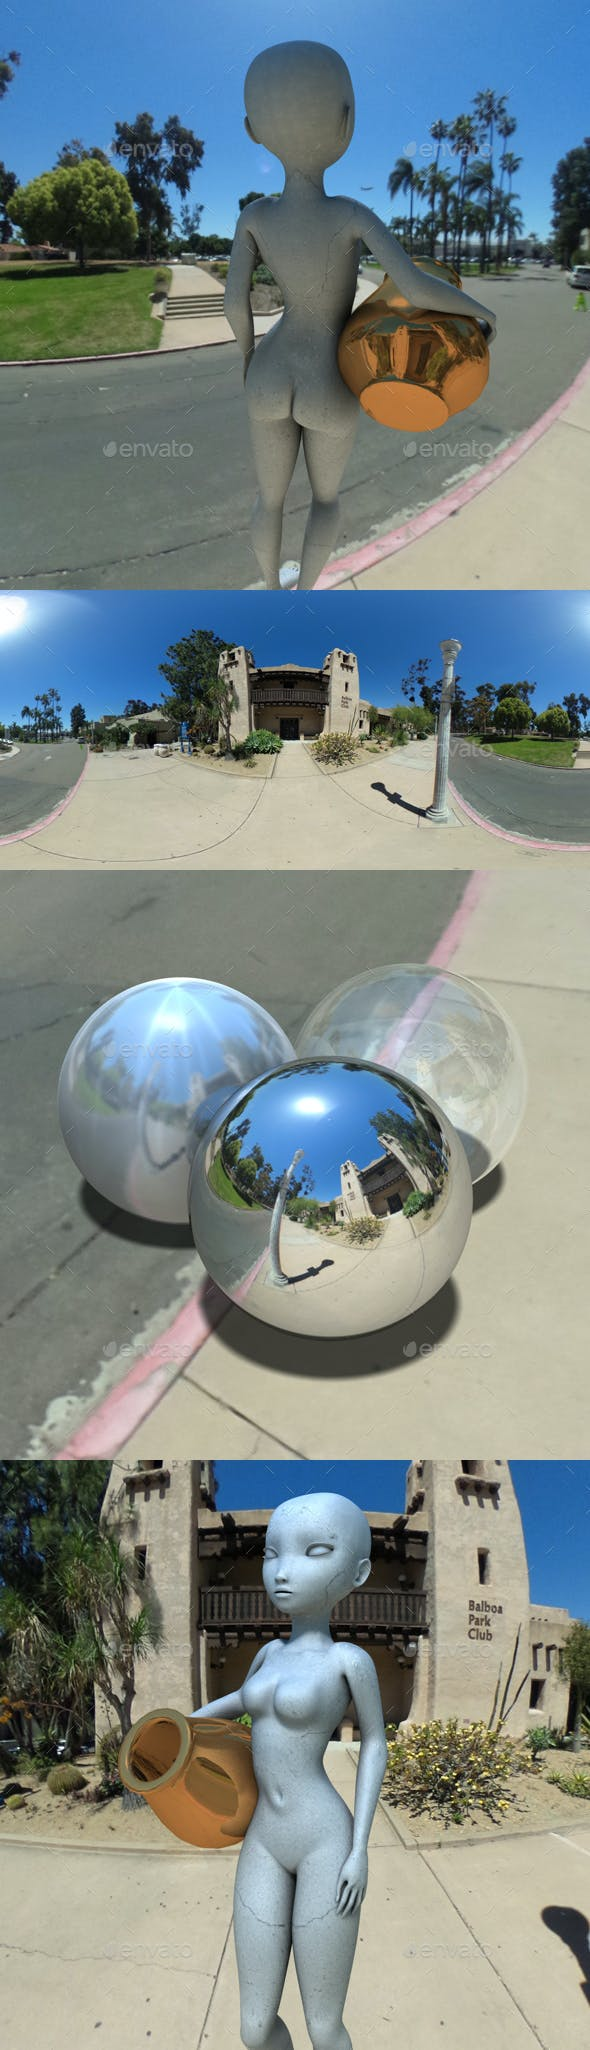 Balboa Park San Diego HDRI - 3DOcean Item for Sale